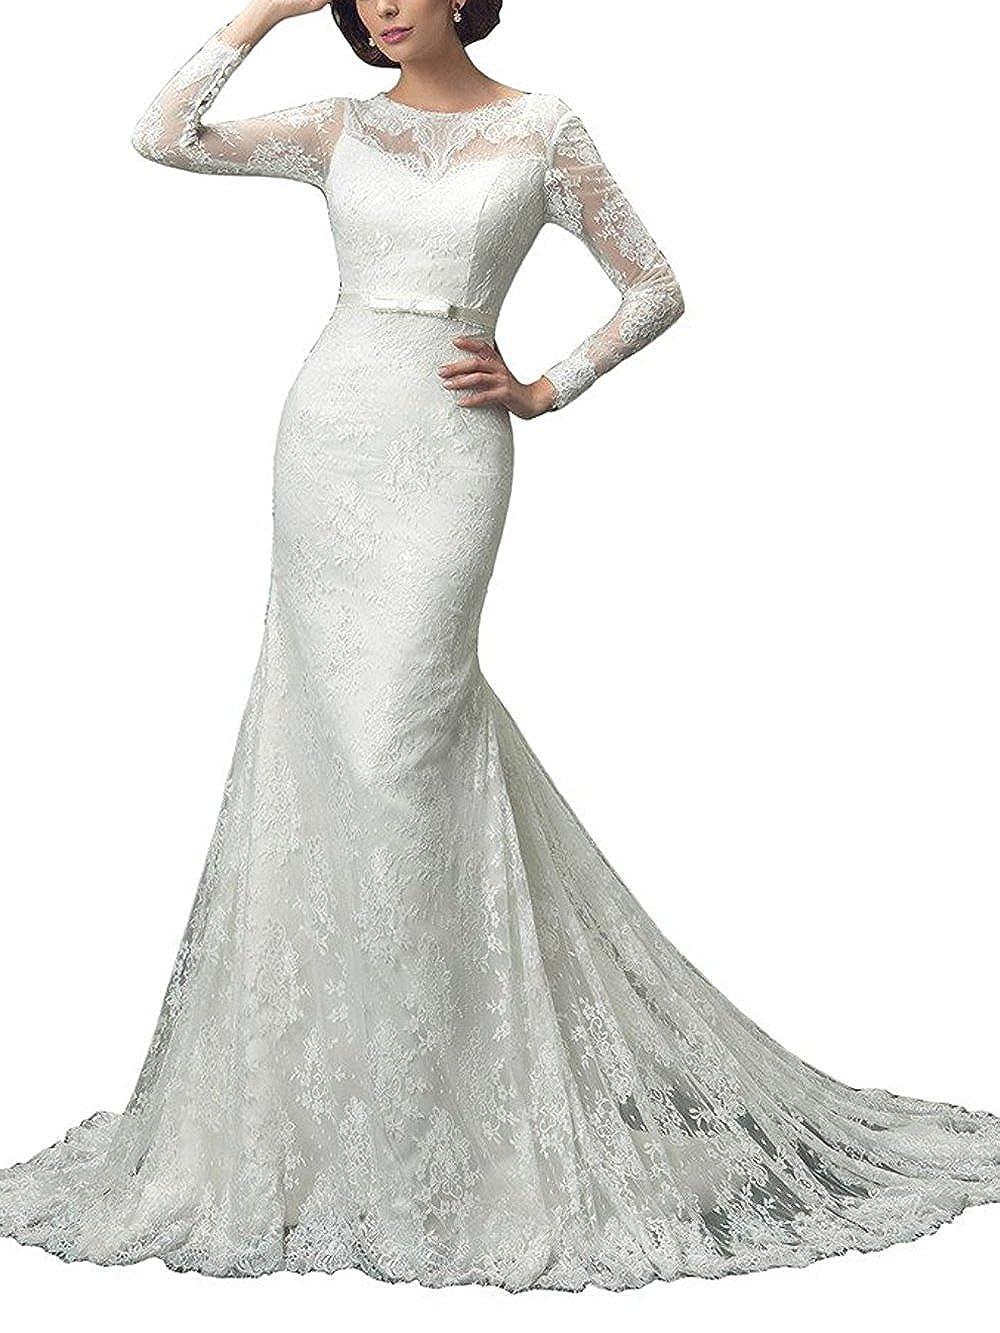 M Bridal Women's Illusion Long Sleeve Crew Neck Long Mermaid Bride Wedding Dress